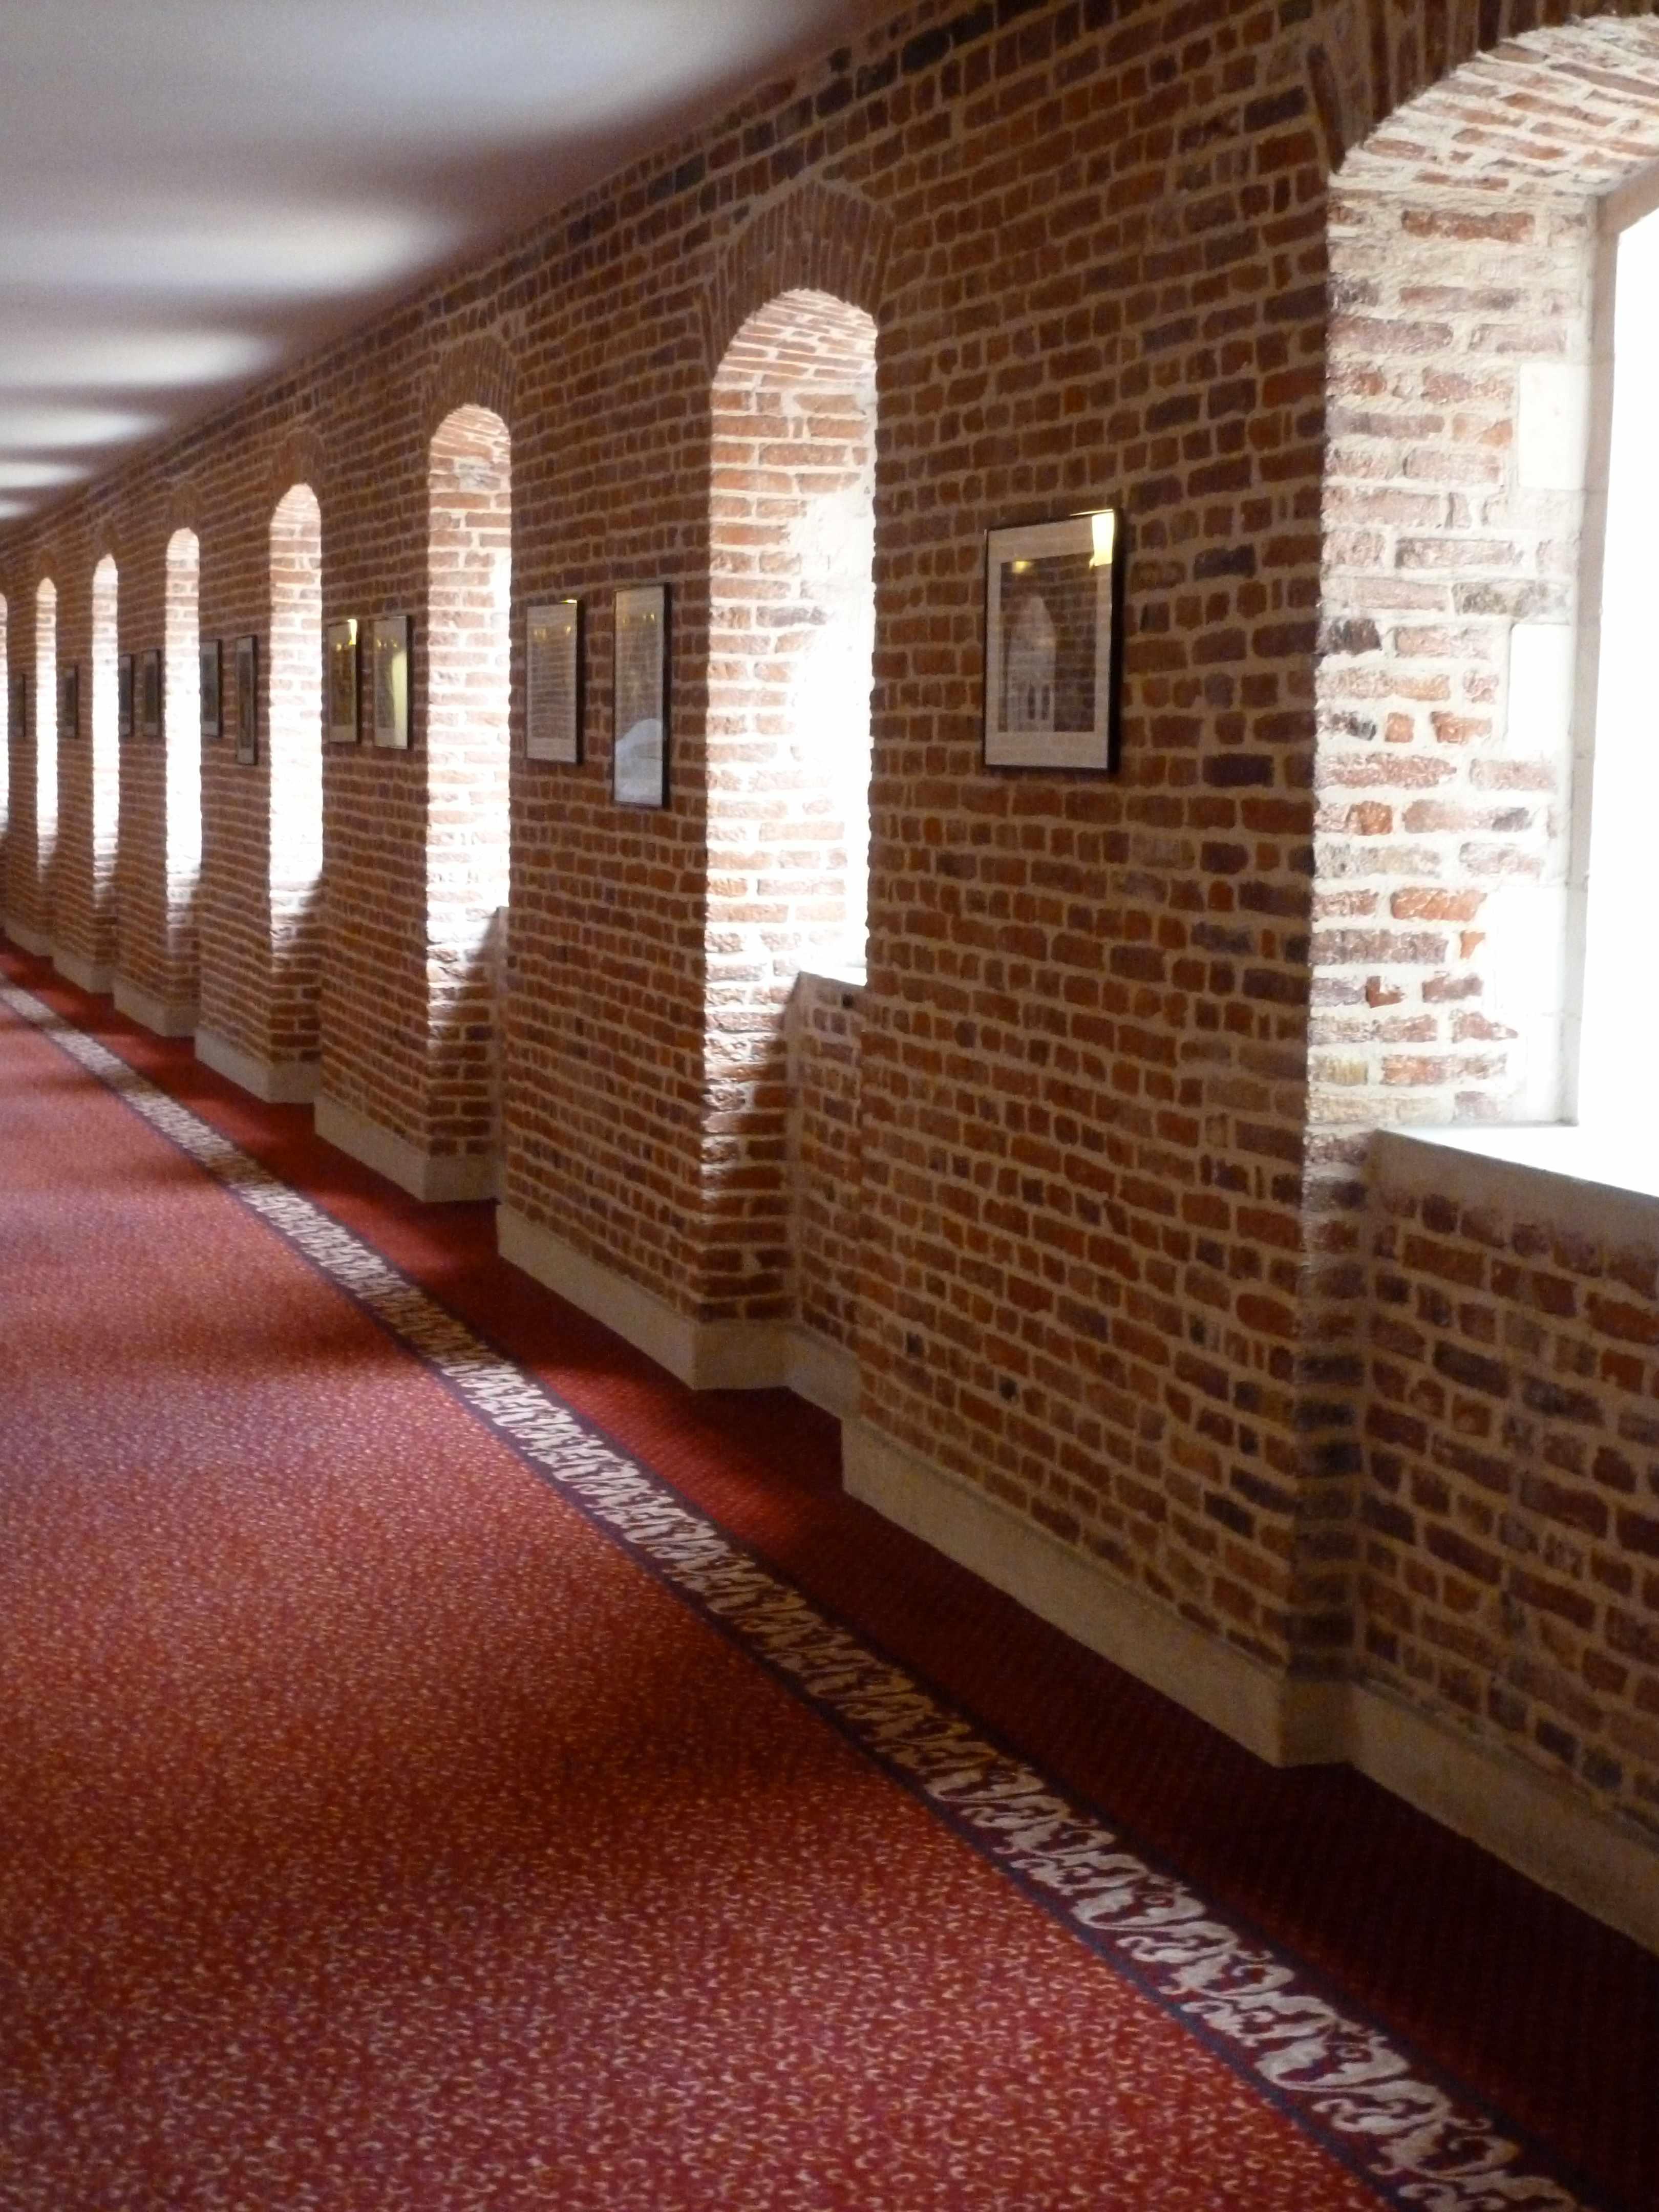 2014-10 Lille Couvent minimes coursive hotel